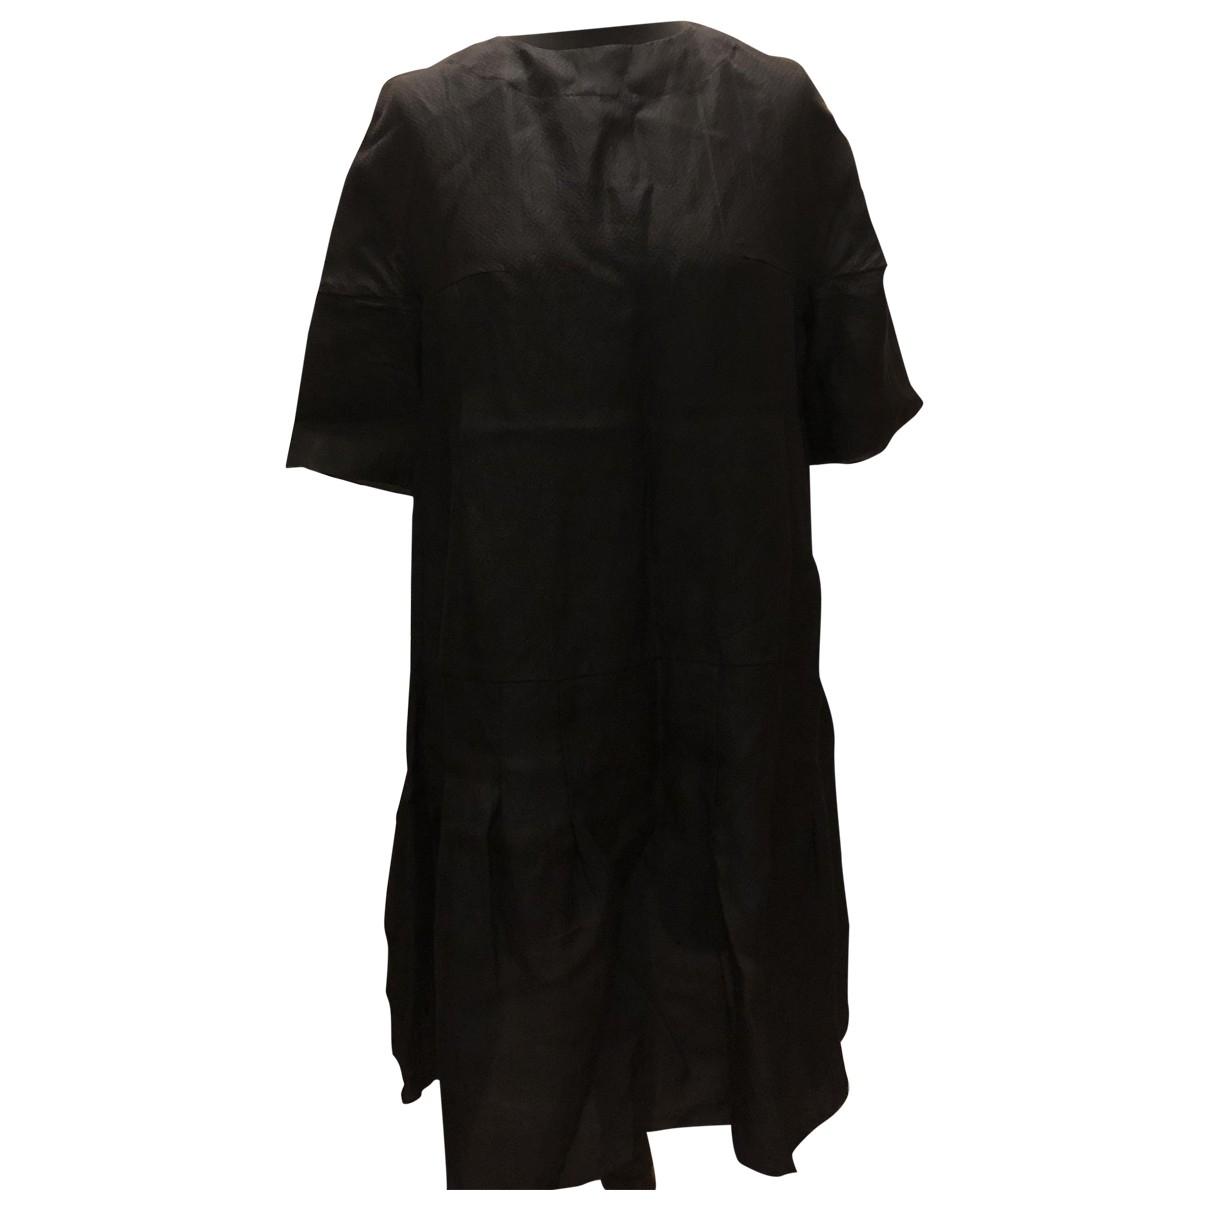 Marni \N Kleid in  Schwarz Seide